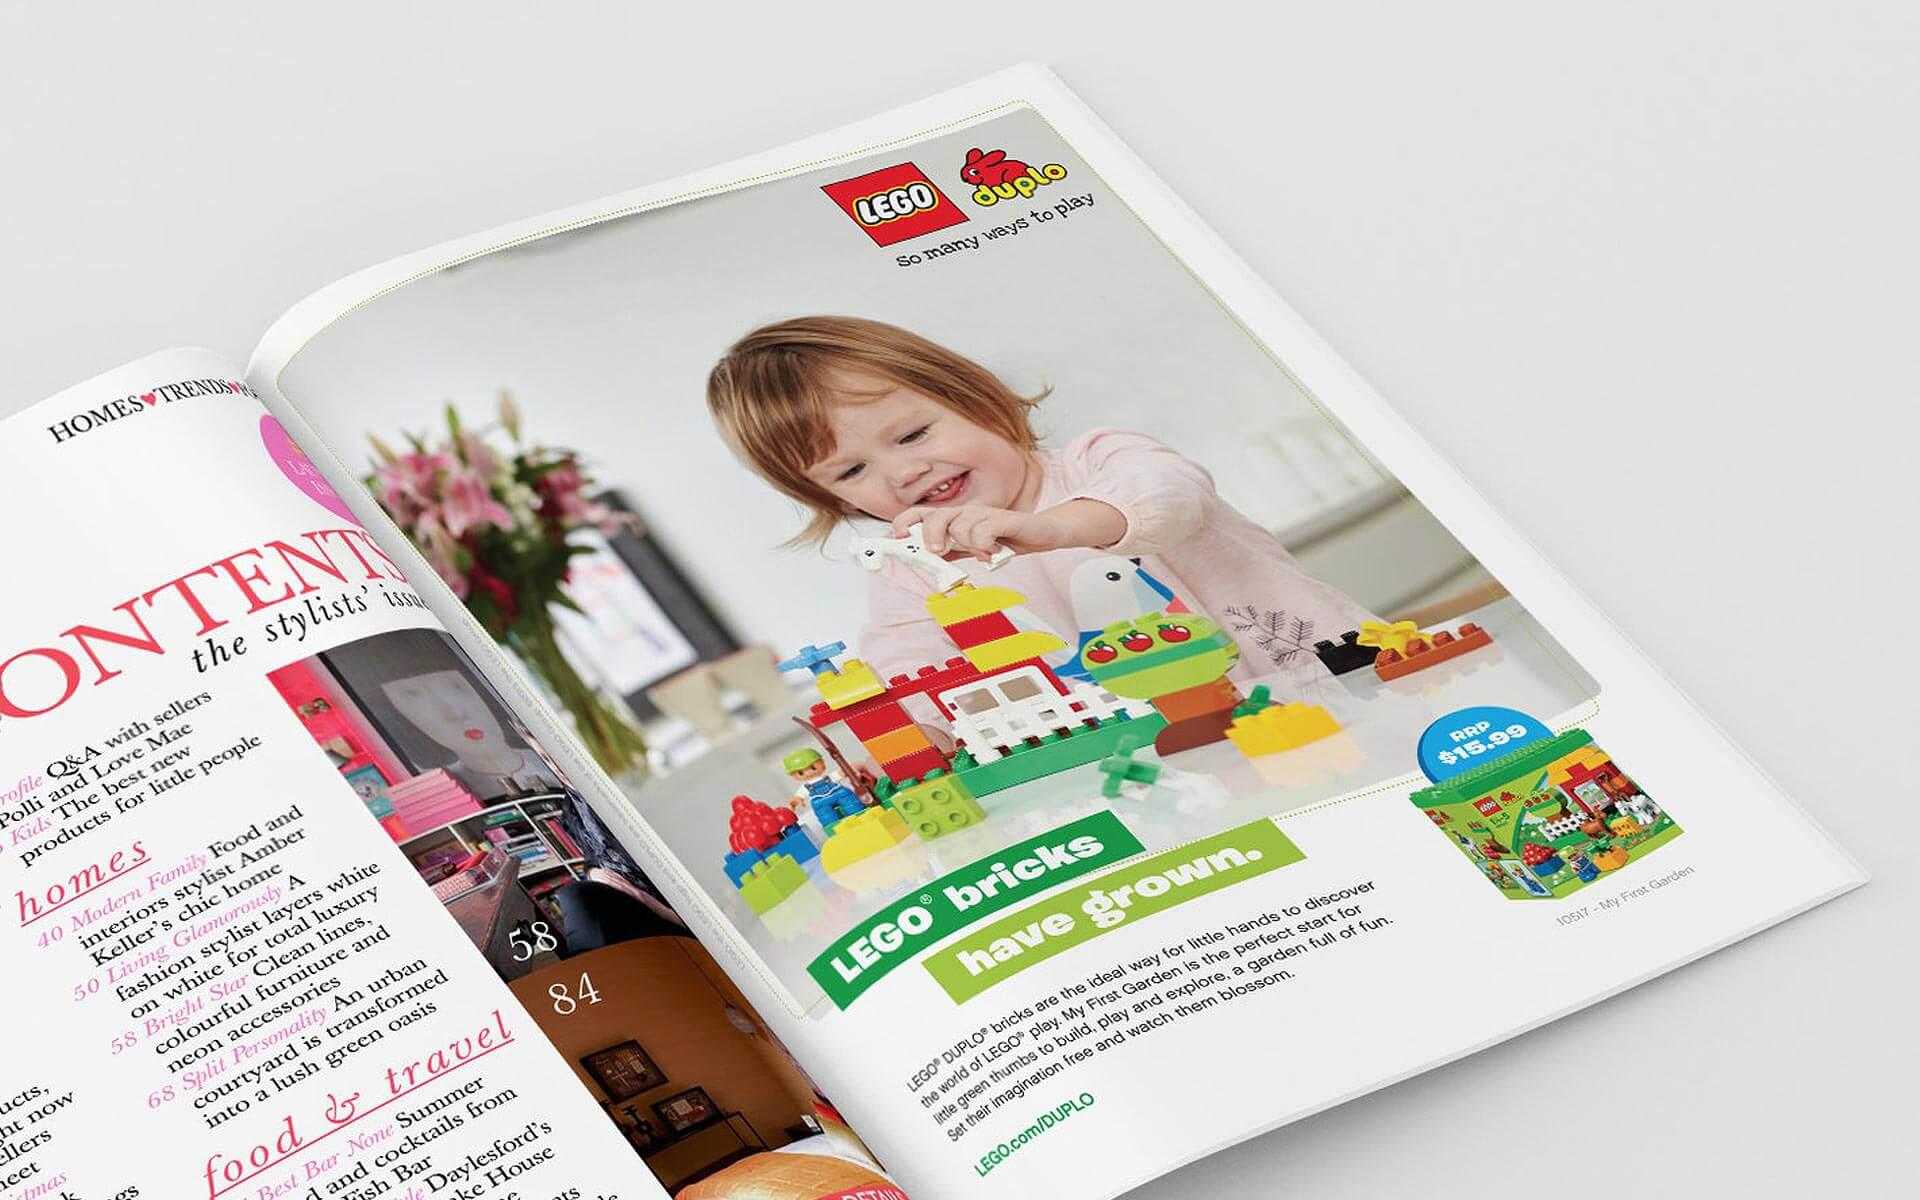 LEGO Duplo print ad, LEGO bricks have grown